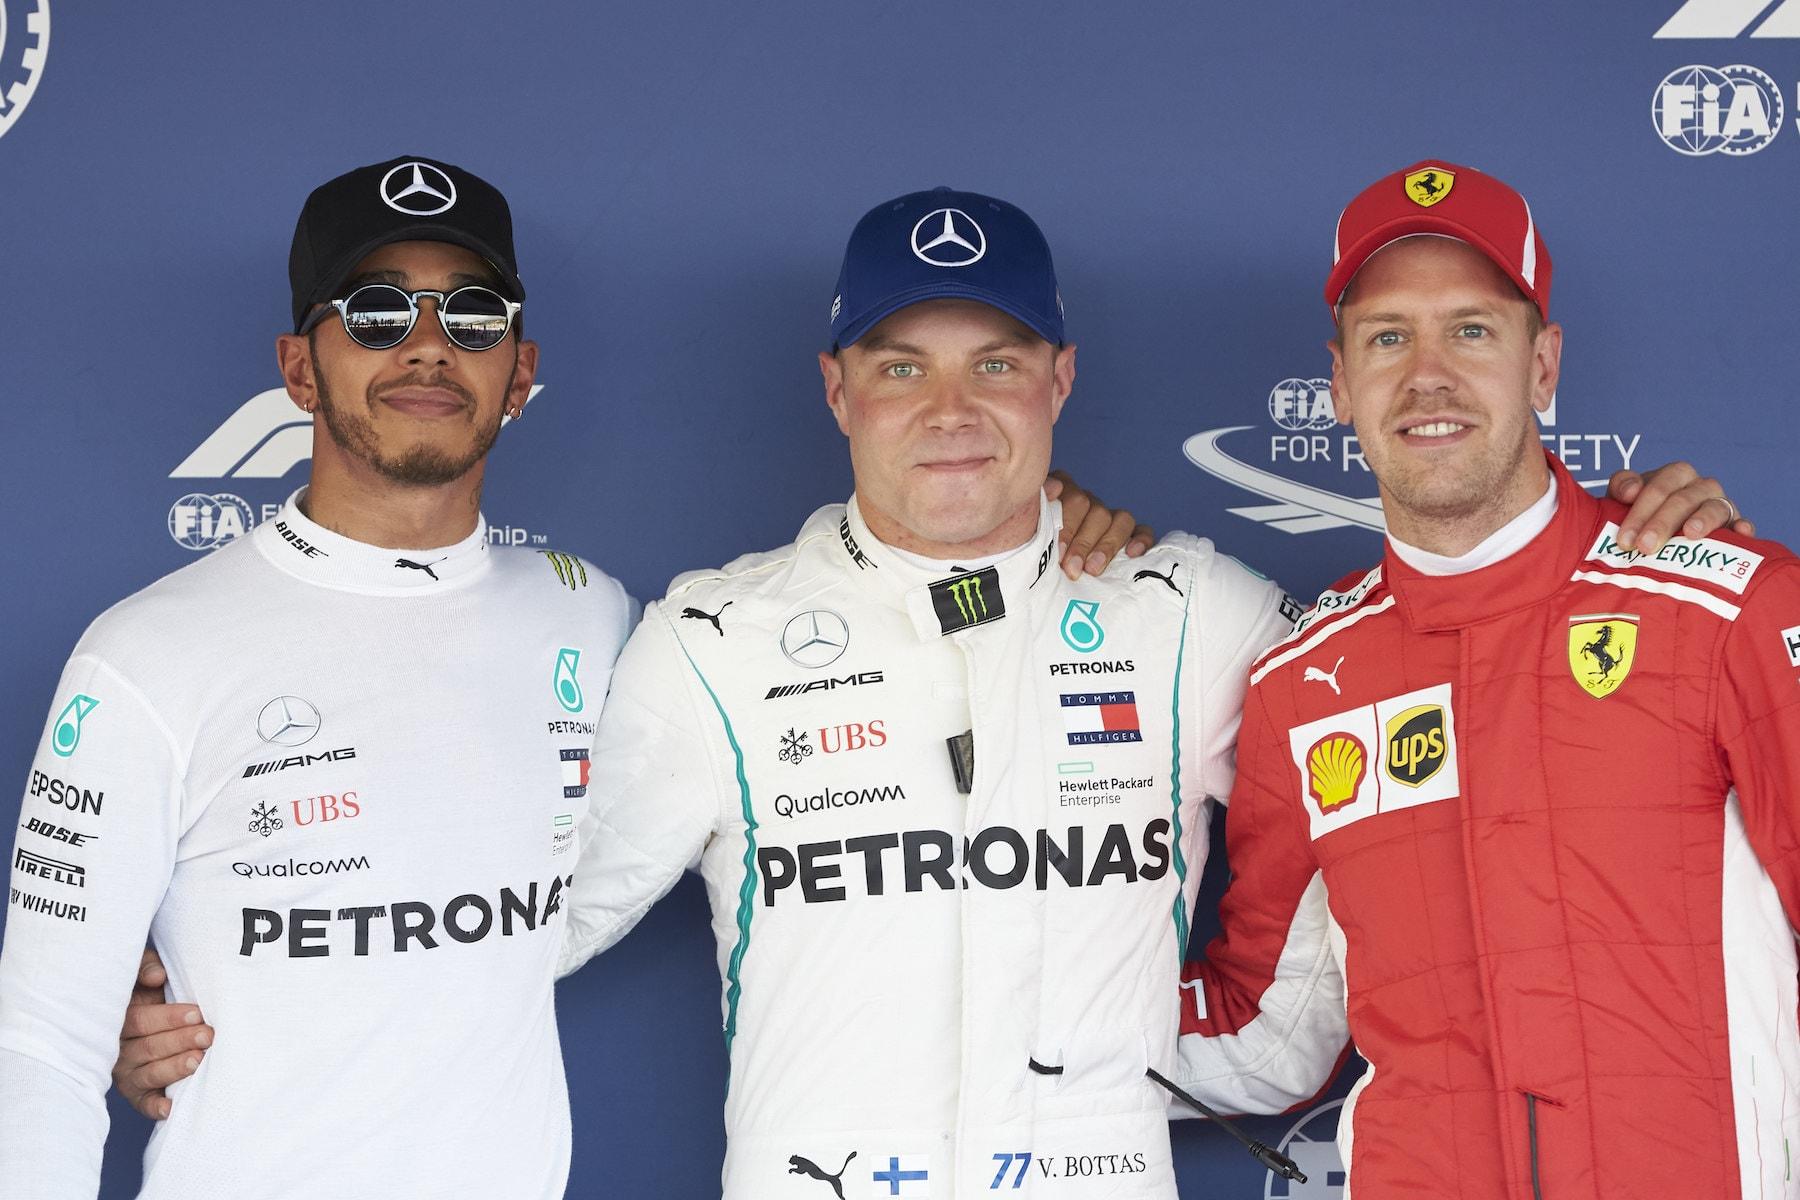 2018 Polemans | 2018 Russian GP copy.JPG